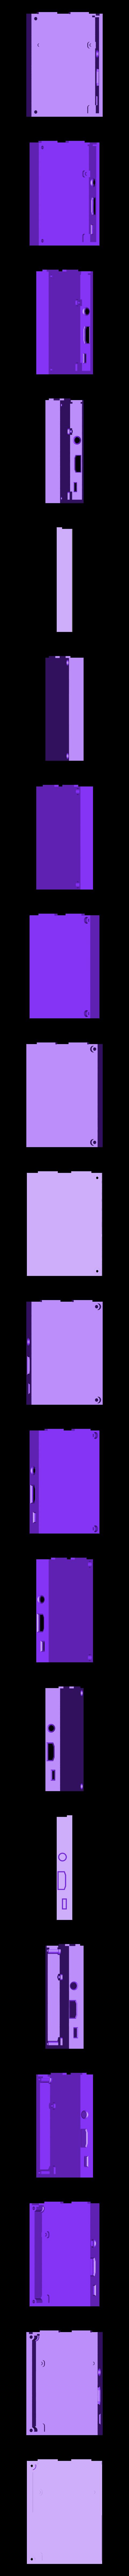 SNES_bottom.stl Download free STL file Super Nintendo Raspberry Pi Case • 3D print design, arron_mollet22